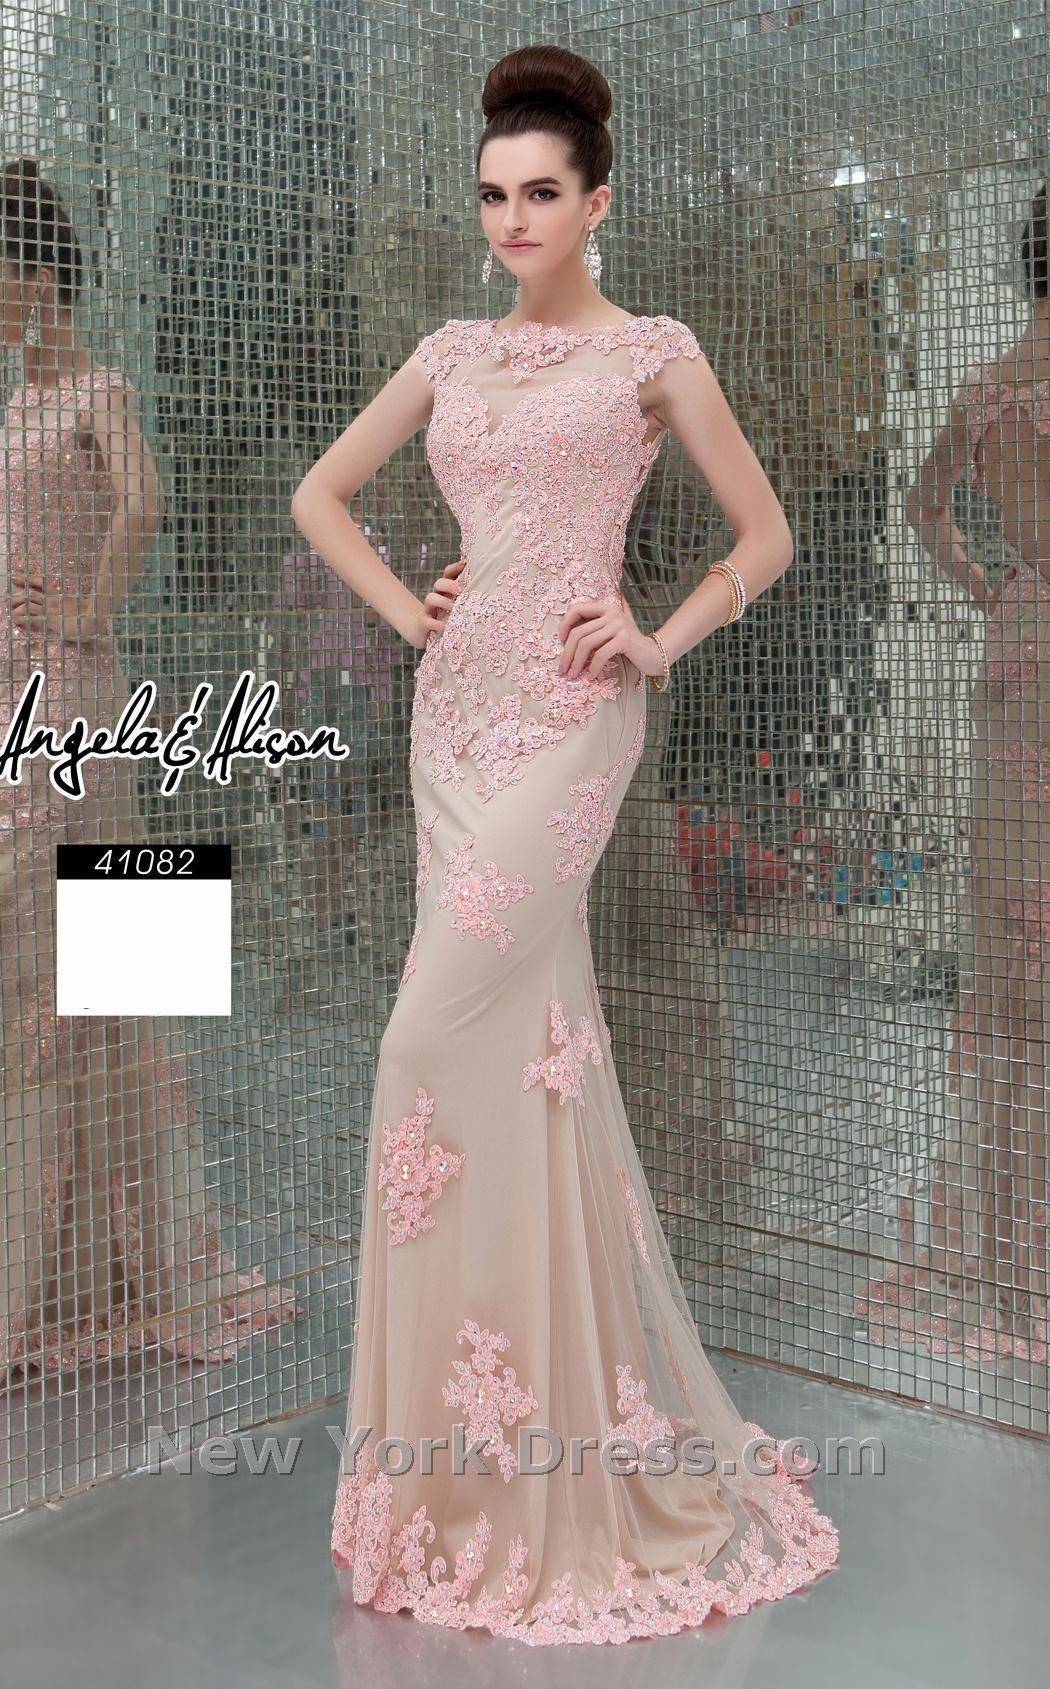 Batik dress for wedding party  JPG  pixels  vestidos elegantes largos